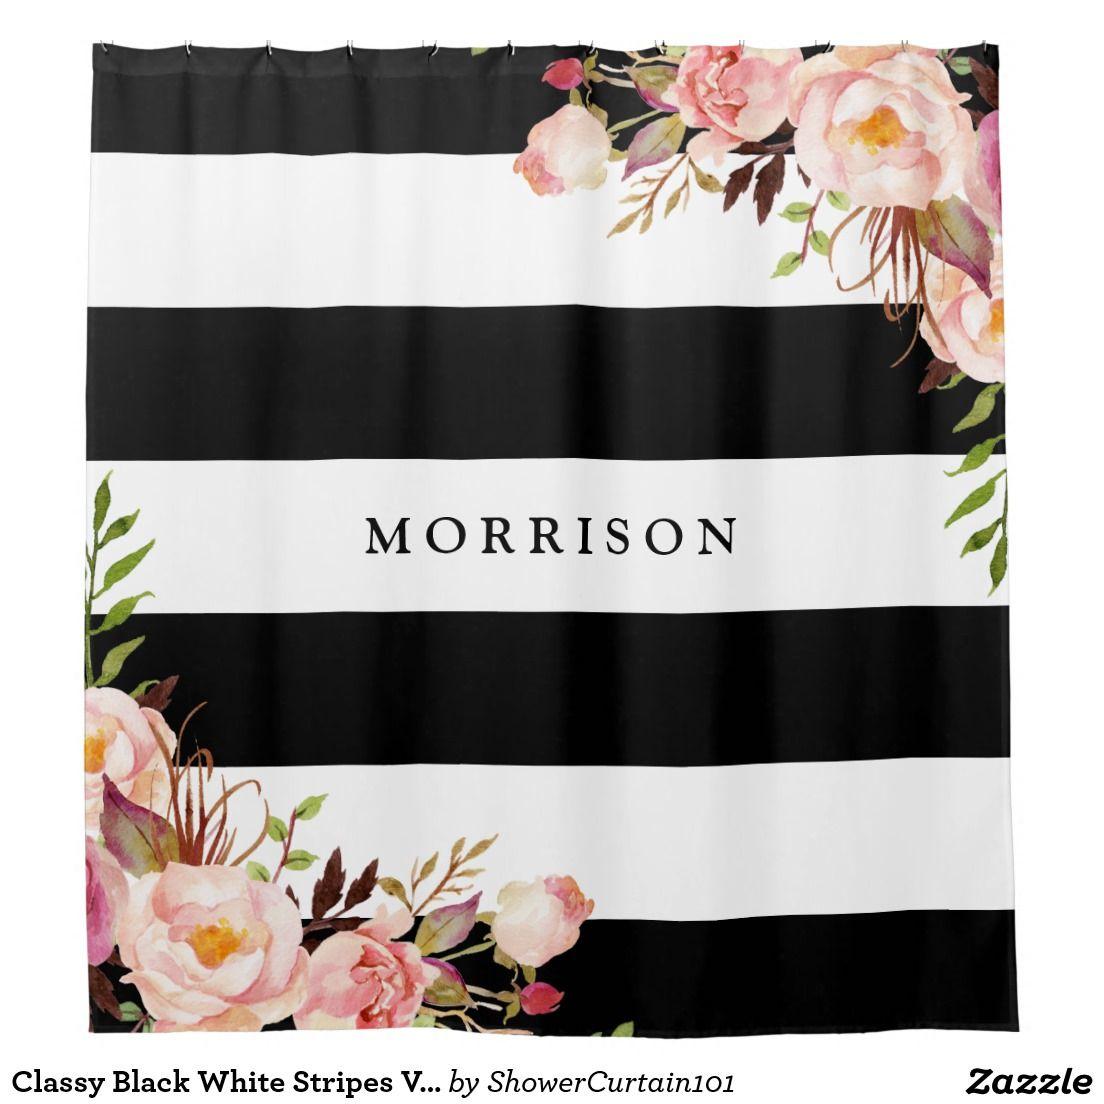 Classy Black White Stripes Vintage Floral Monogram Shower Curtain ...